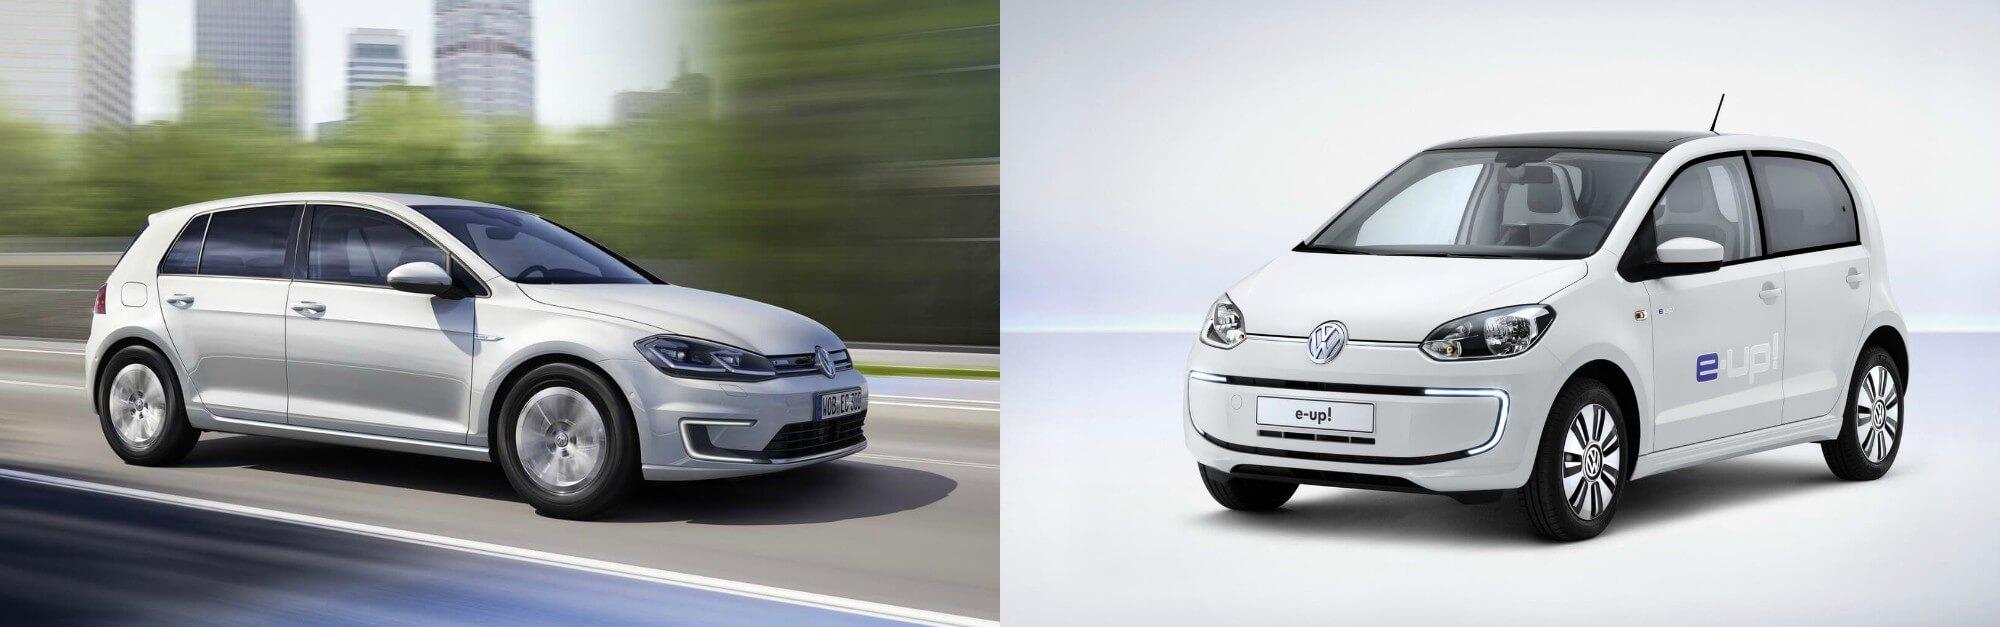 Электромобили Volkswagen e-Golf и e-Up созданные на ДВС платформе